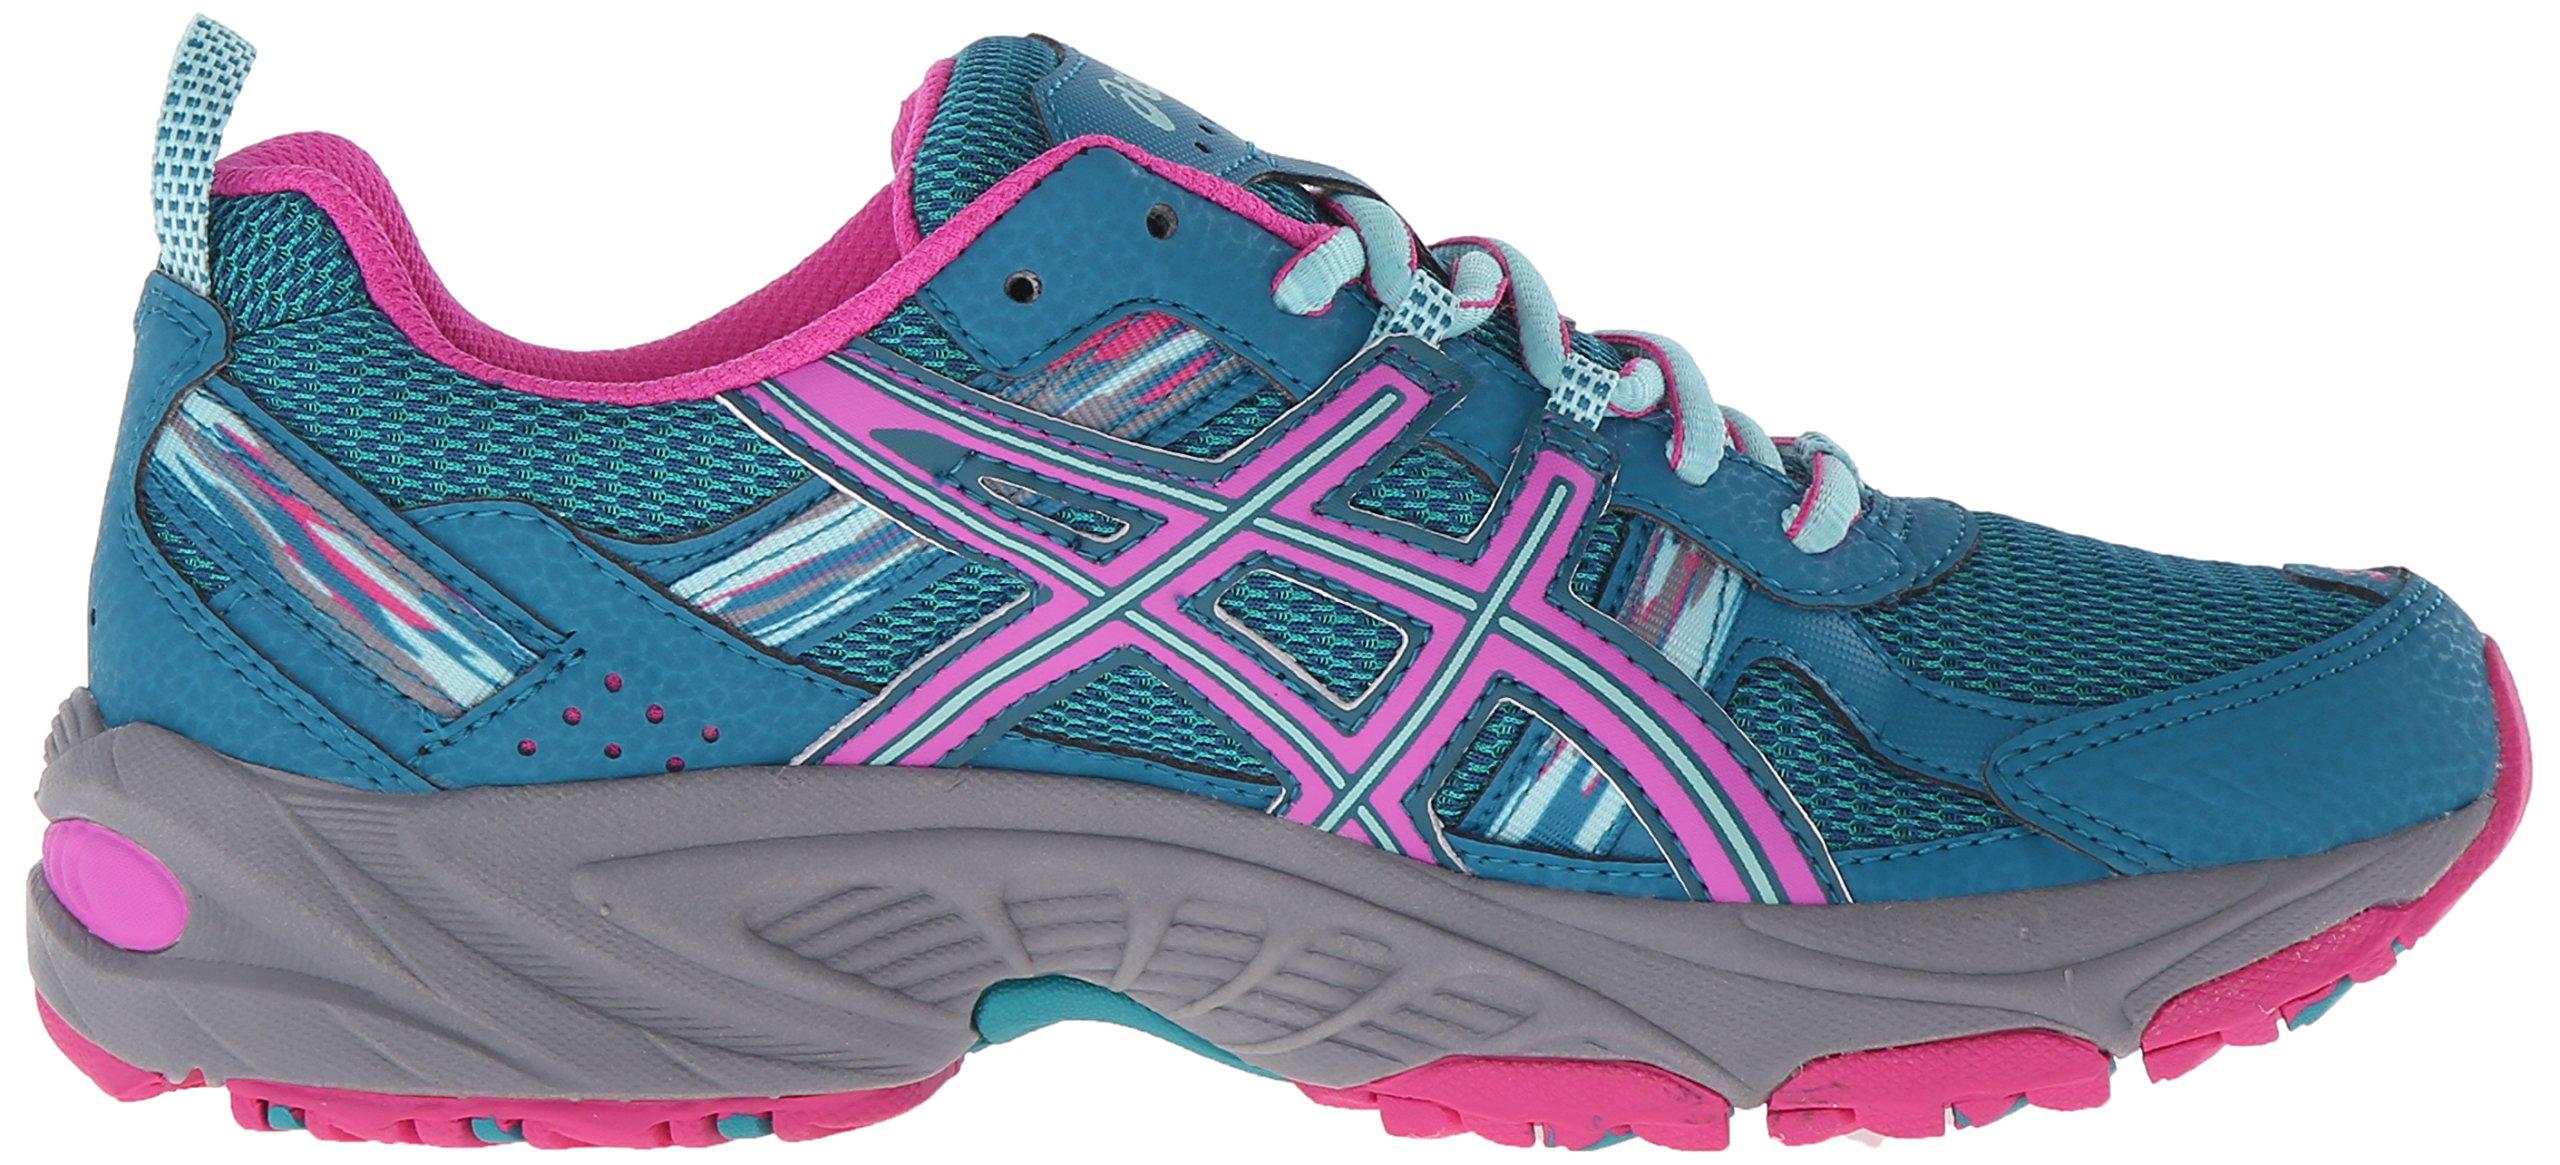 ASICS Women's Gel-Venture 5 Trail Runner Ocean Depth/Pink Glow/Aruba Blue 6 M US by ASICS (Image #7)